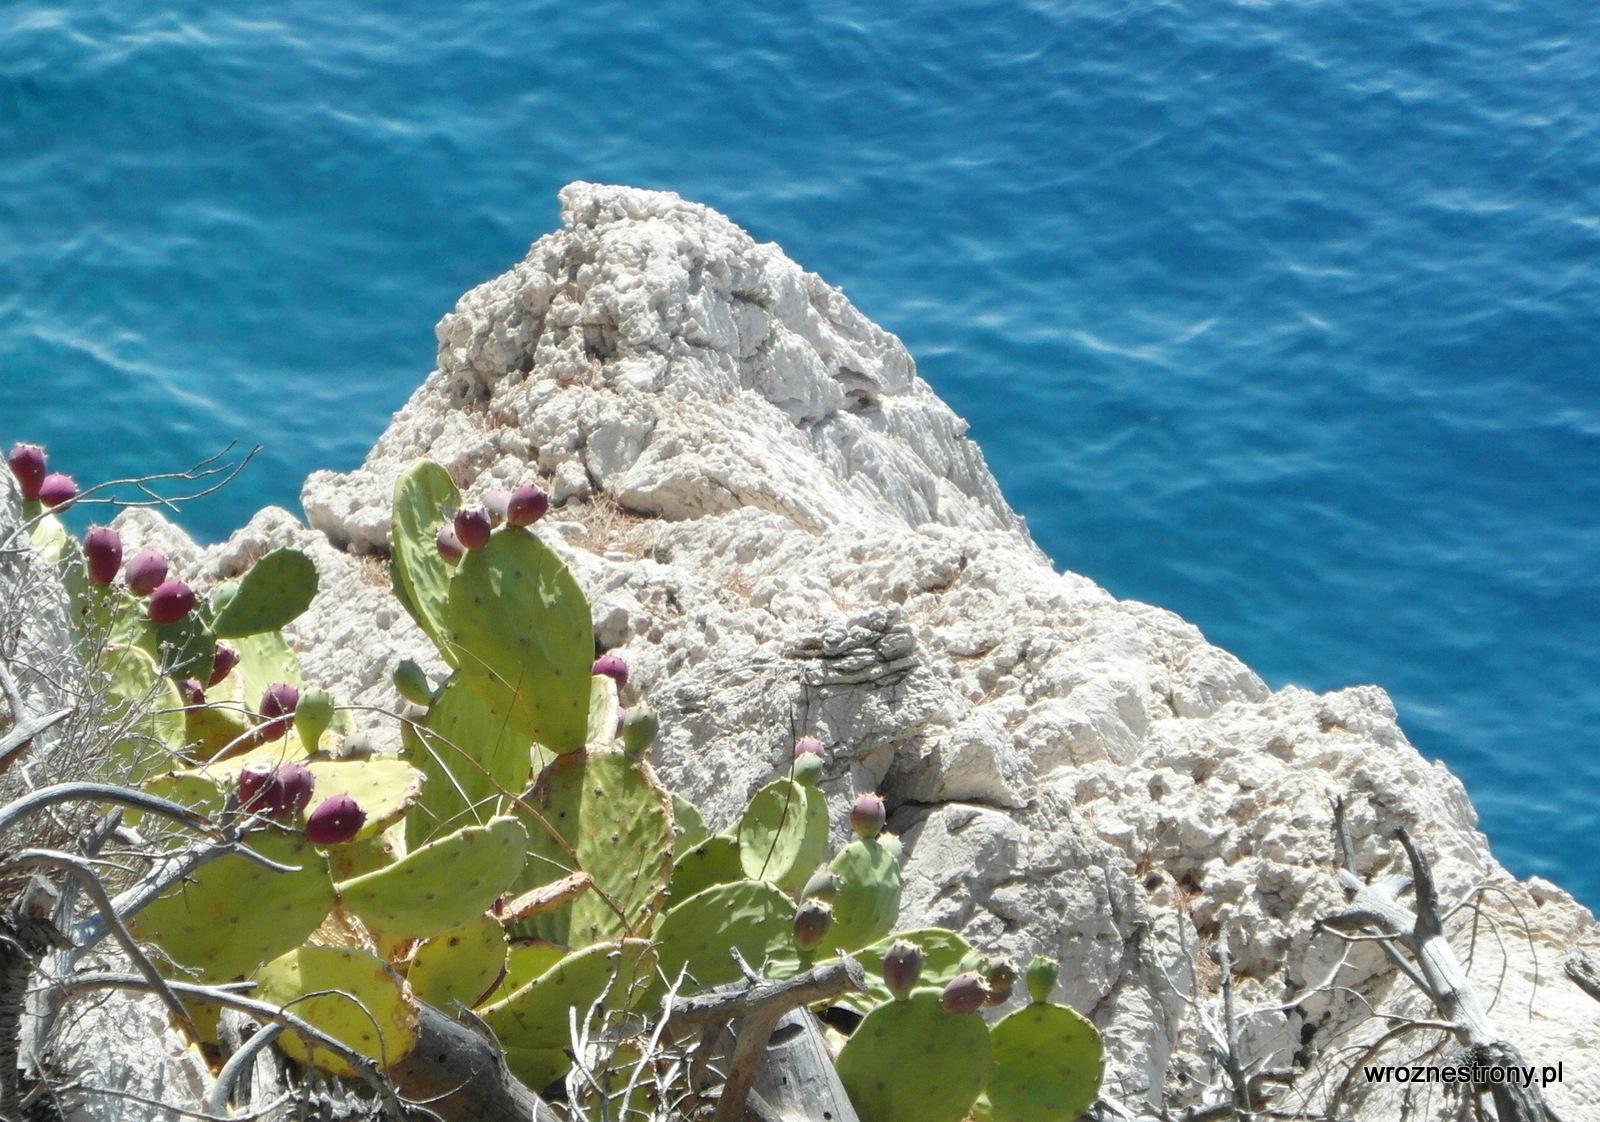 Roślinność śródziemnomorska